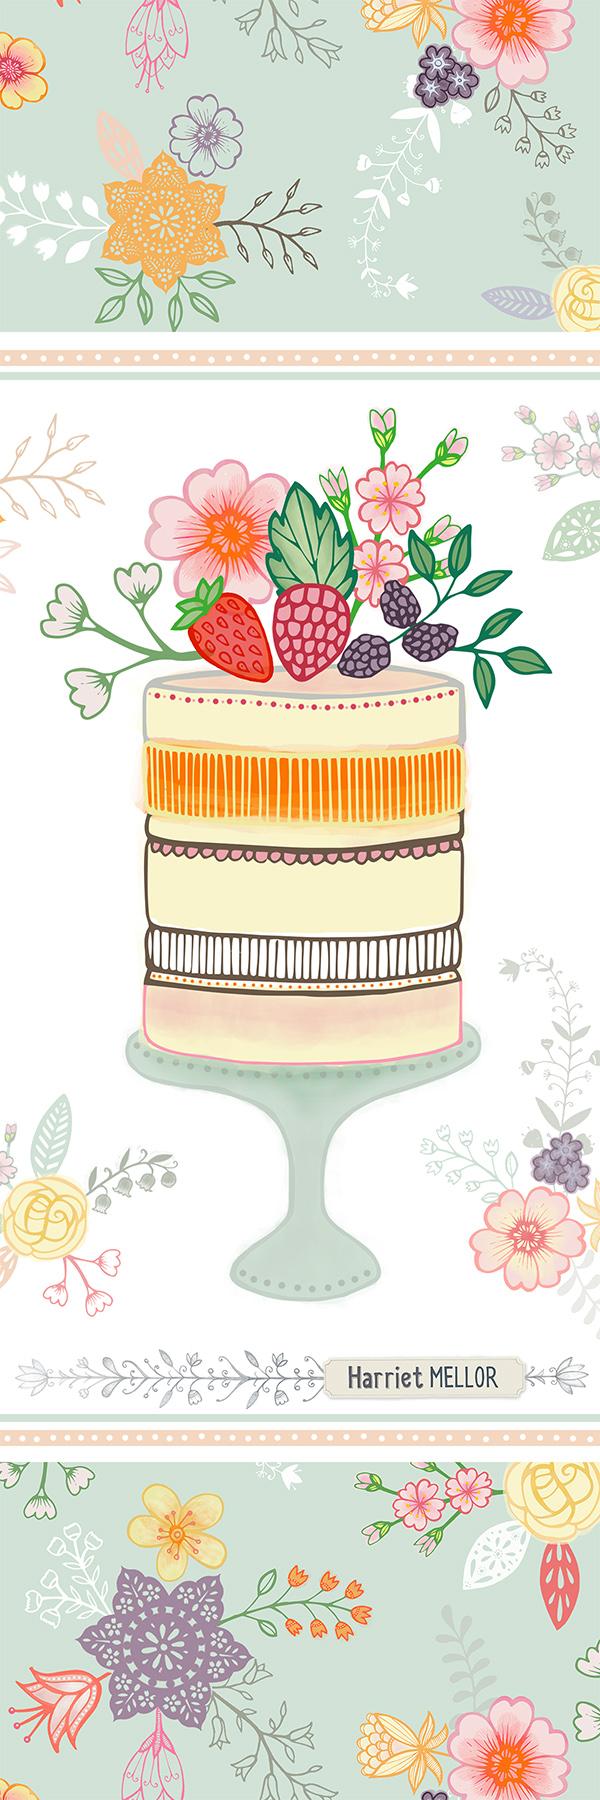 Harriet Mellor fruit cake tall pin